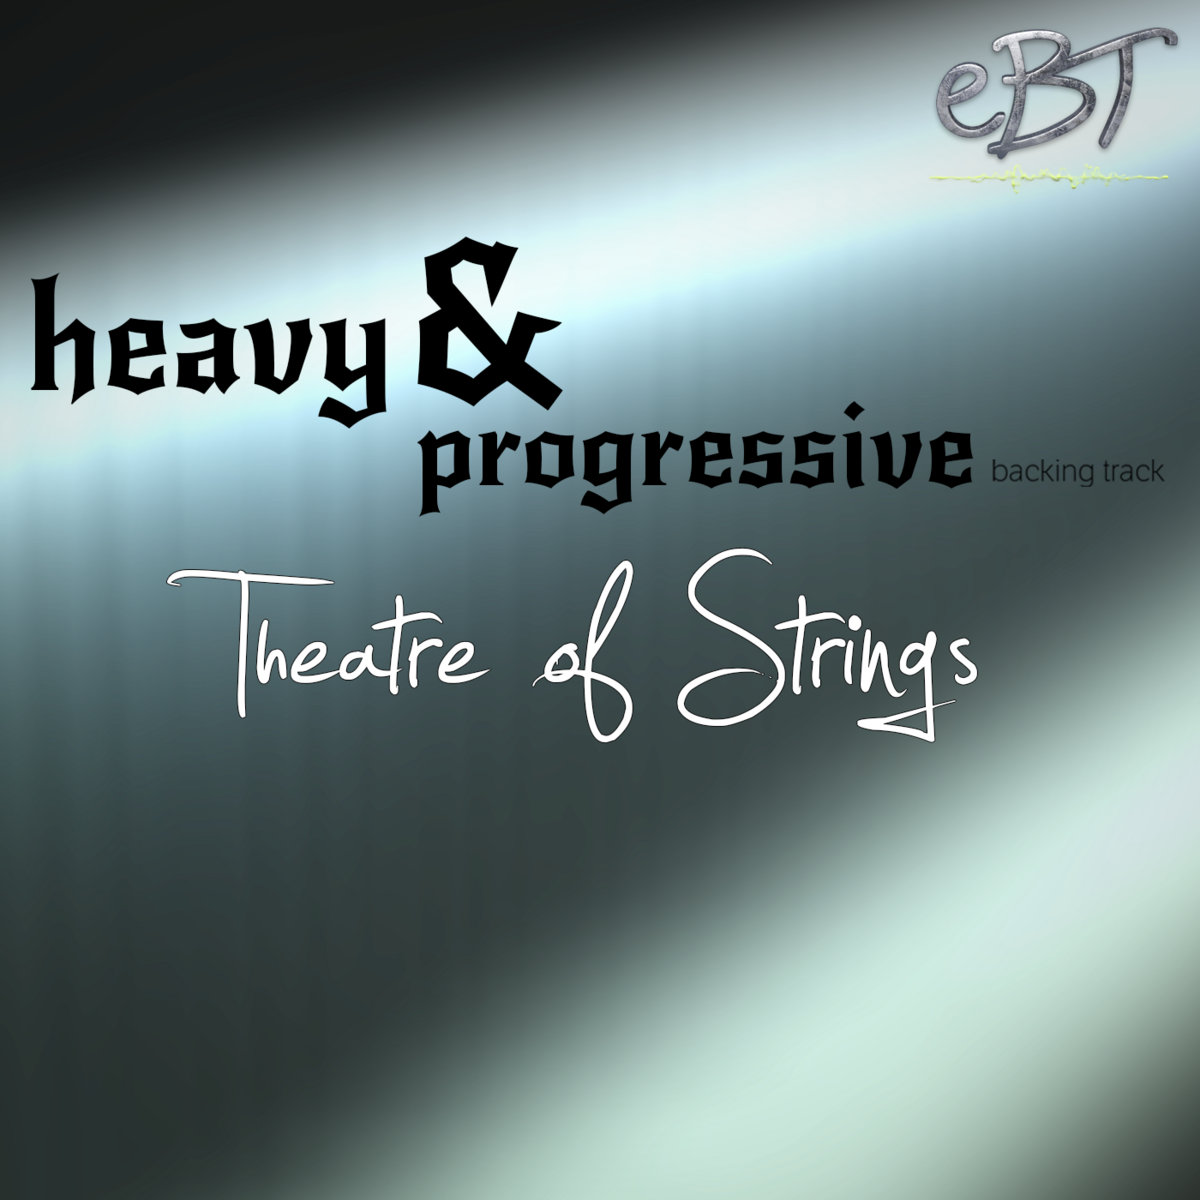 Theatre of Strings   Elite Backing Tracks